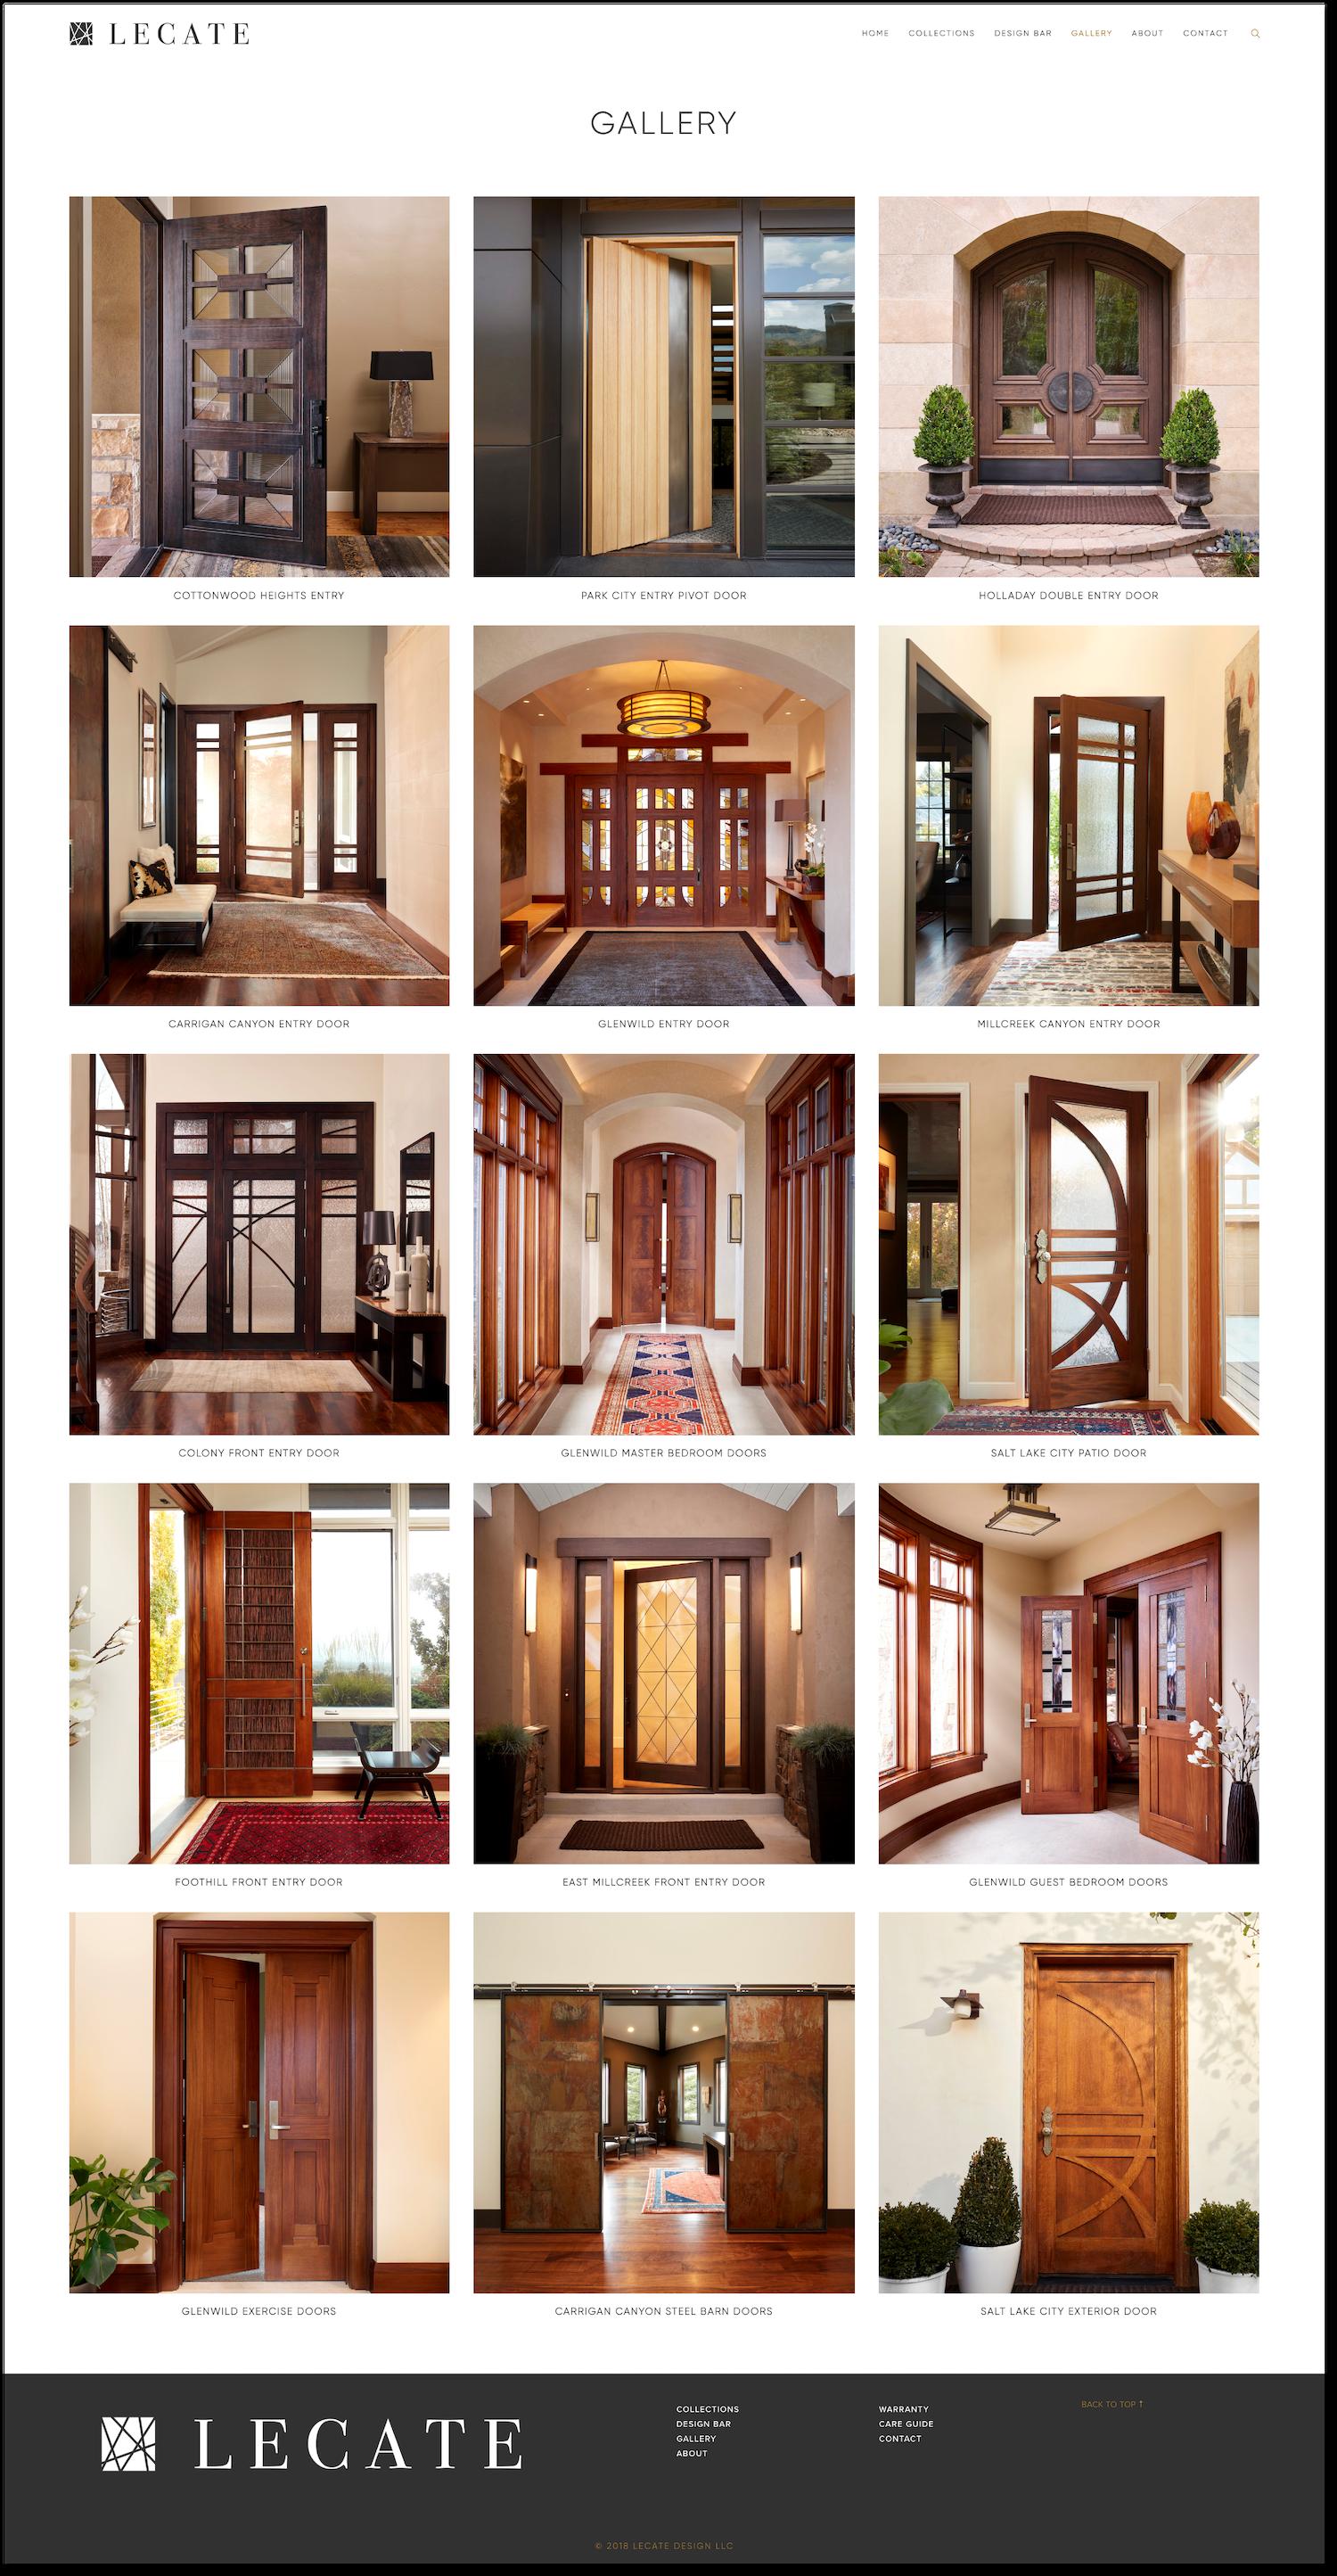 Lecate-Gallery-Page-Design-Website-Squarespace-Artisan-Doors-Salt-Lake-City-Treadaway-Design.png